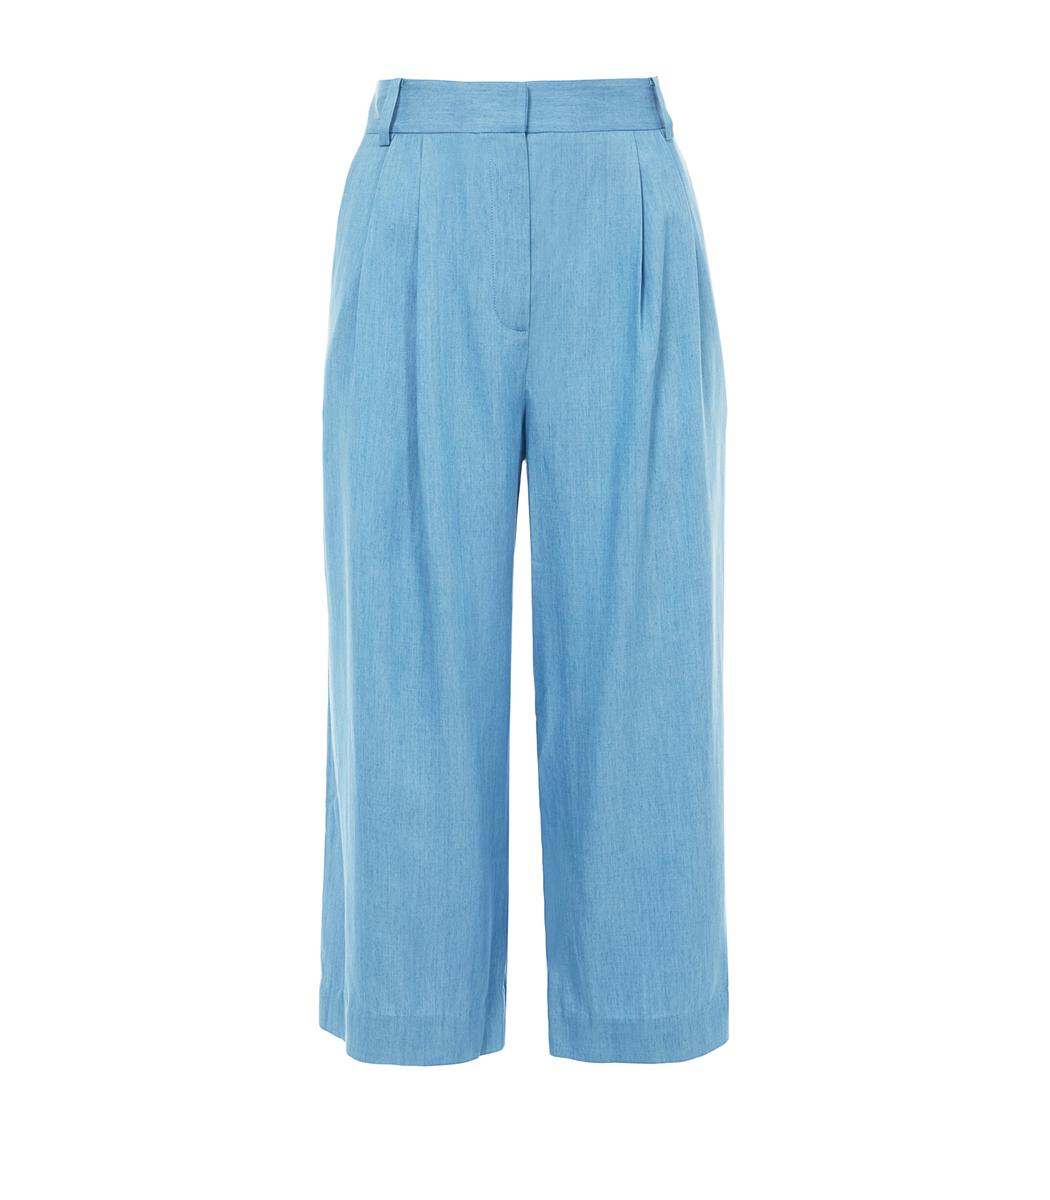 Light Denim Chambray Cropped Pleat Pants